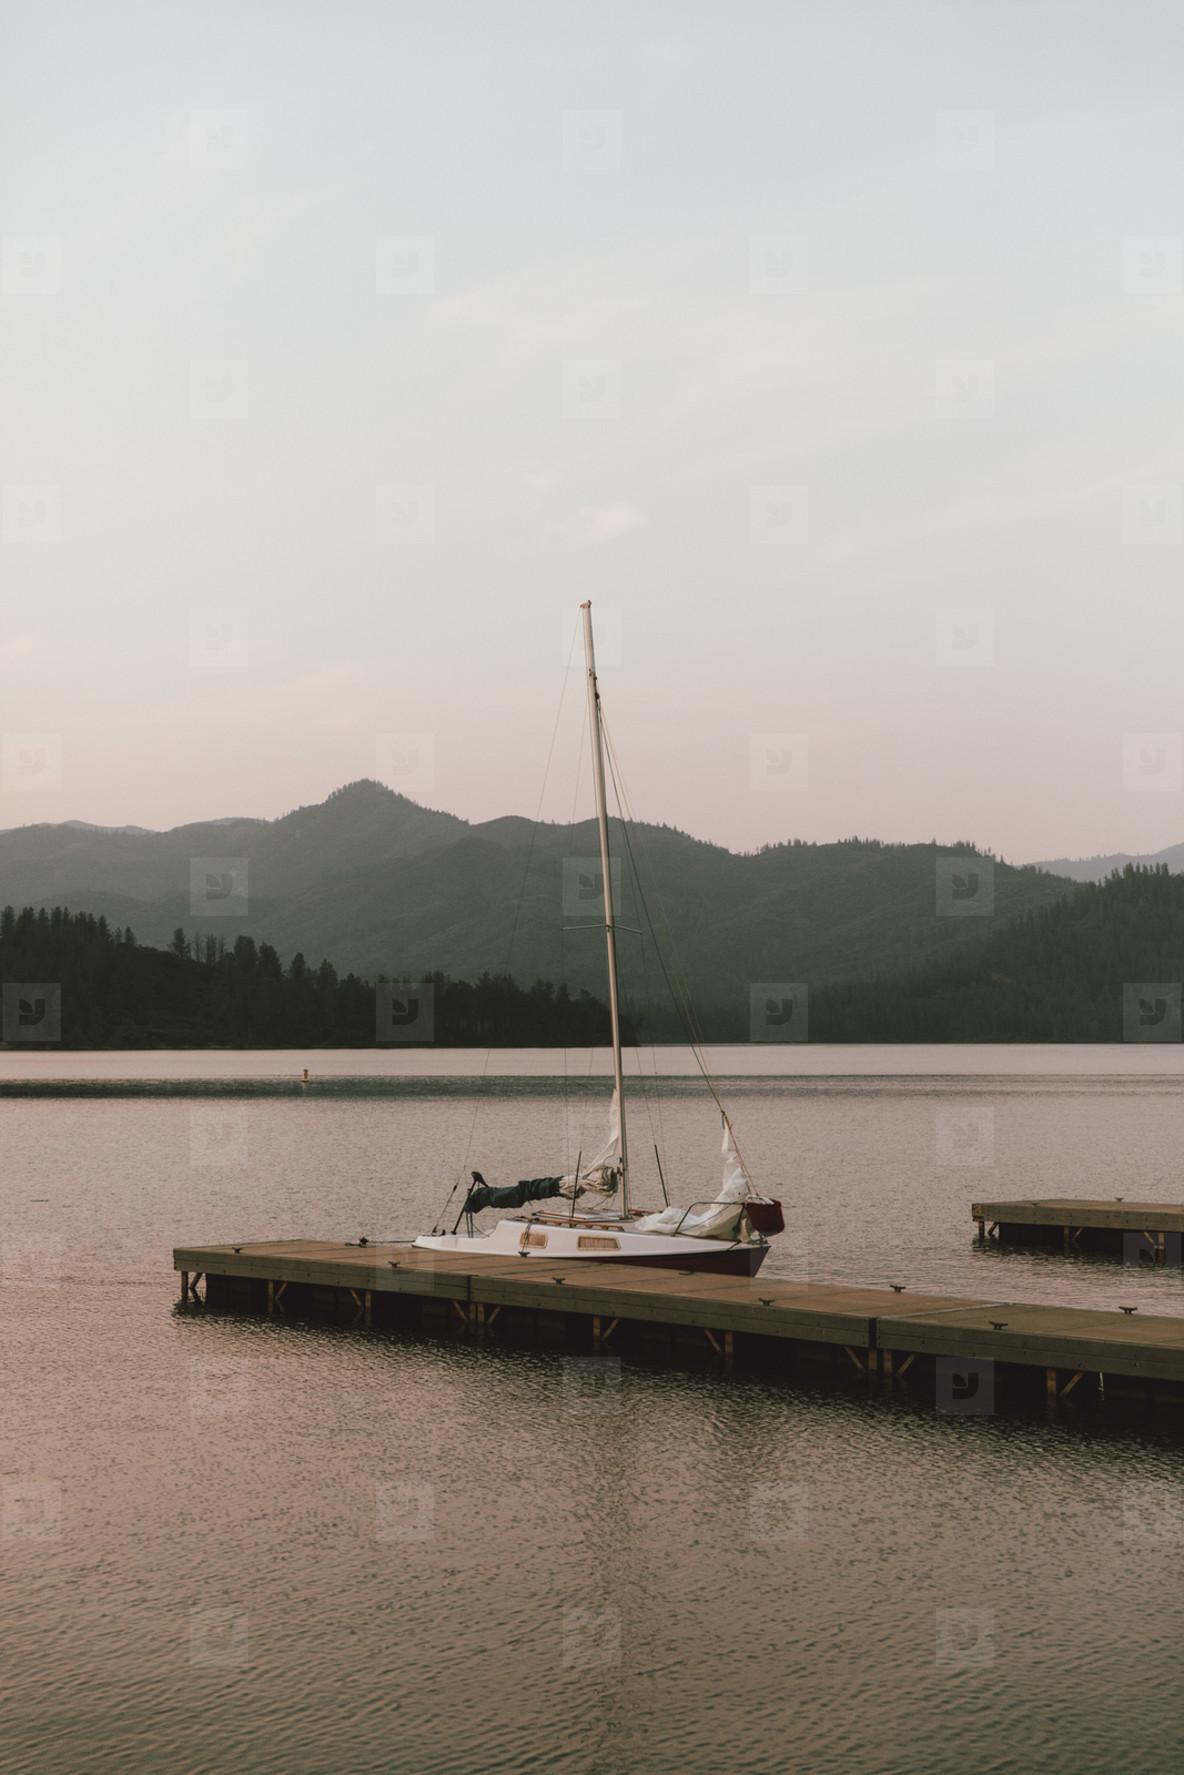 Sailboat moored at dock on tranquil Whiskeytown  USA